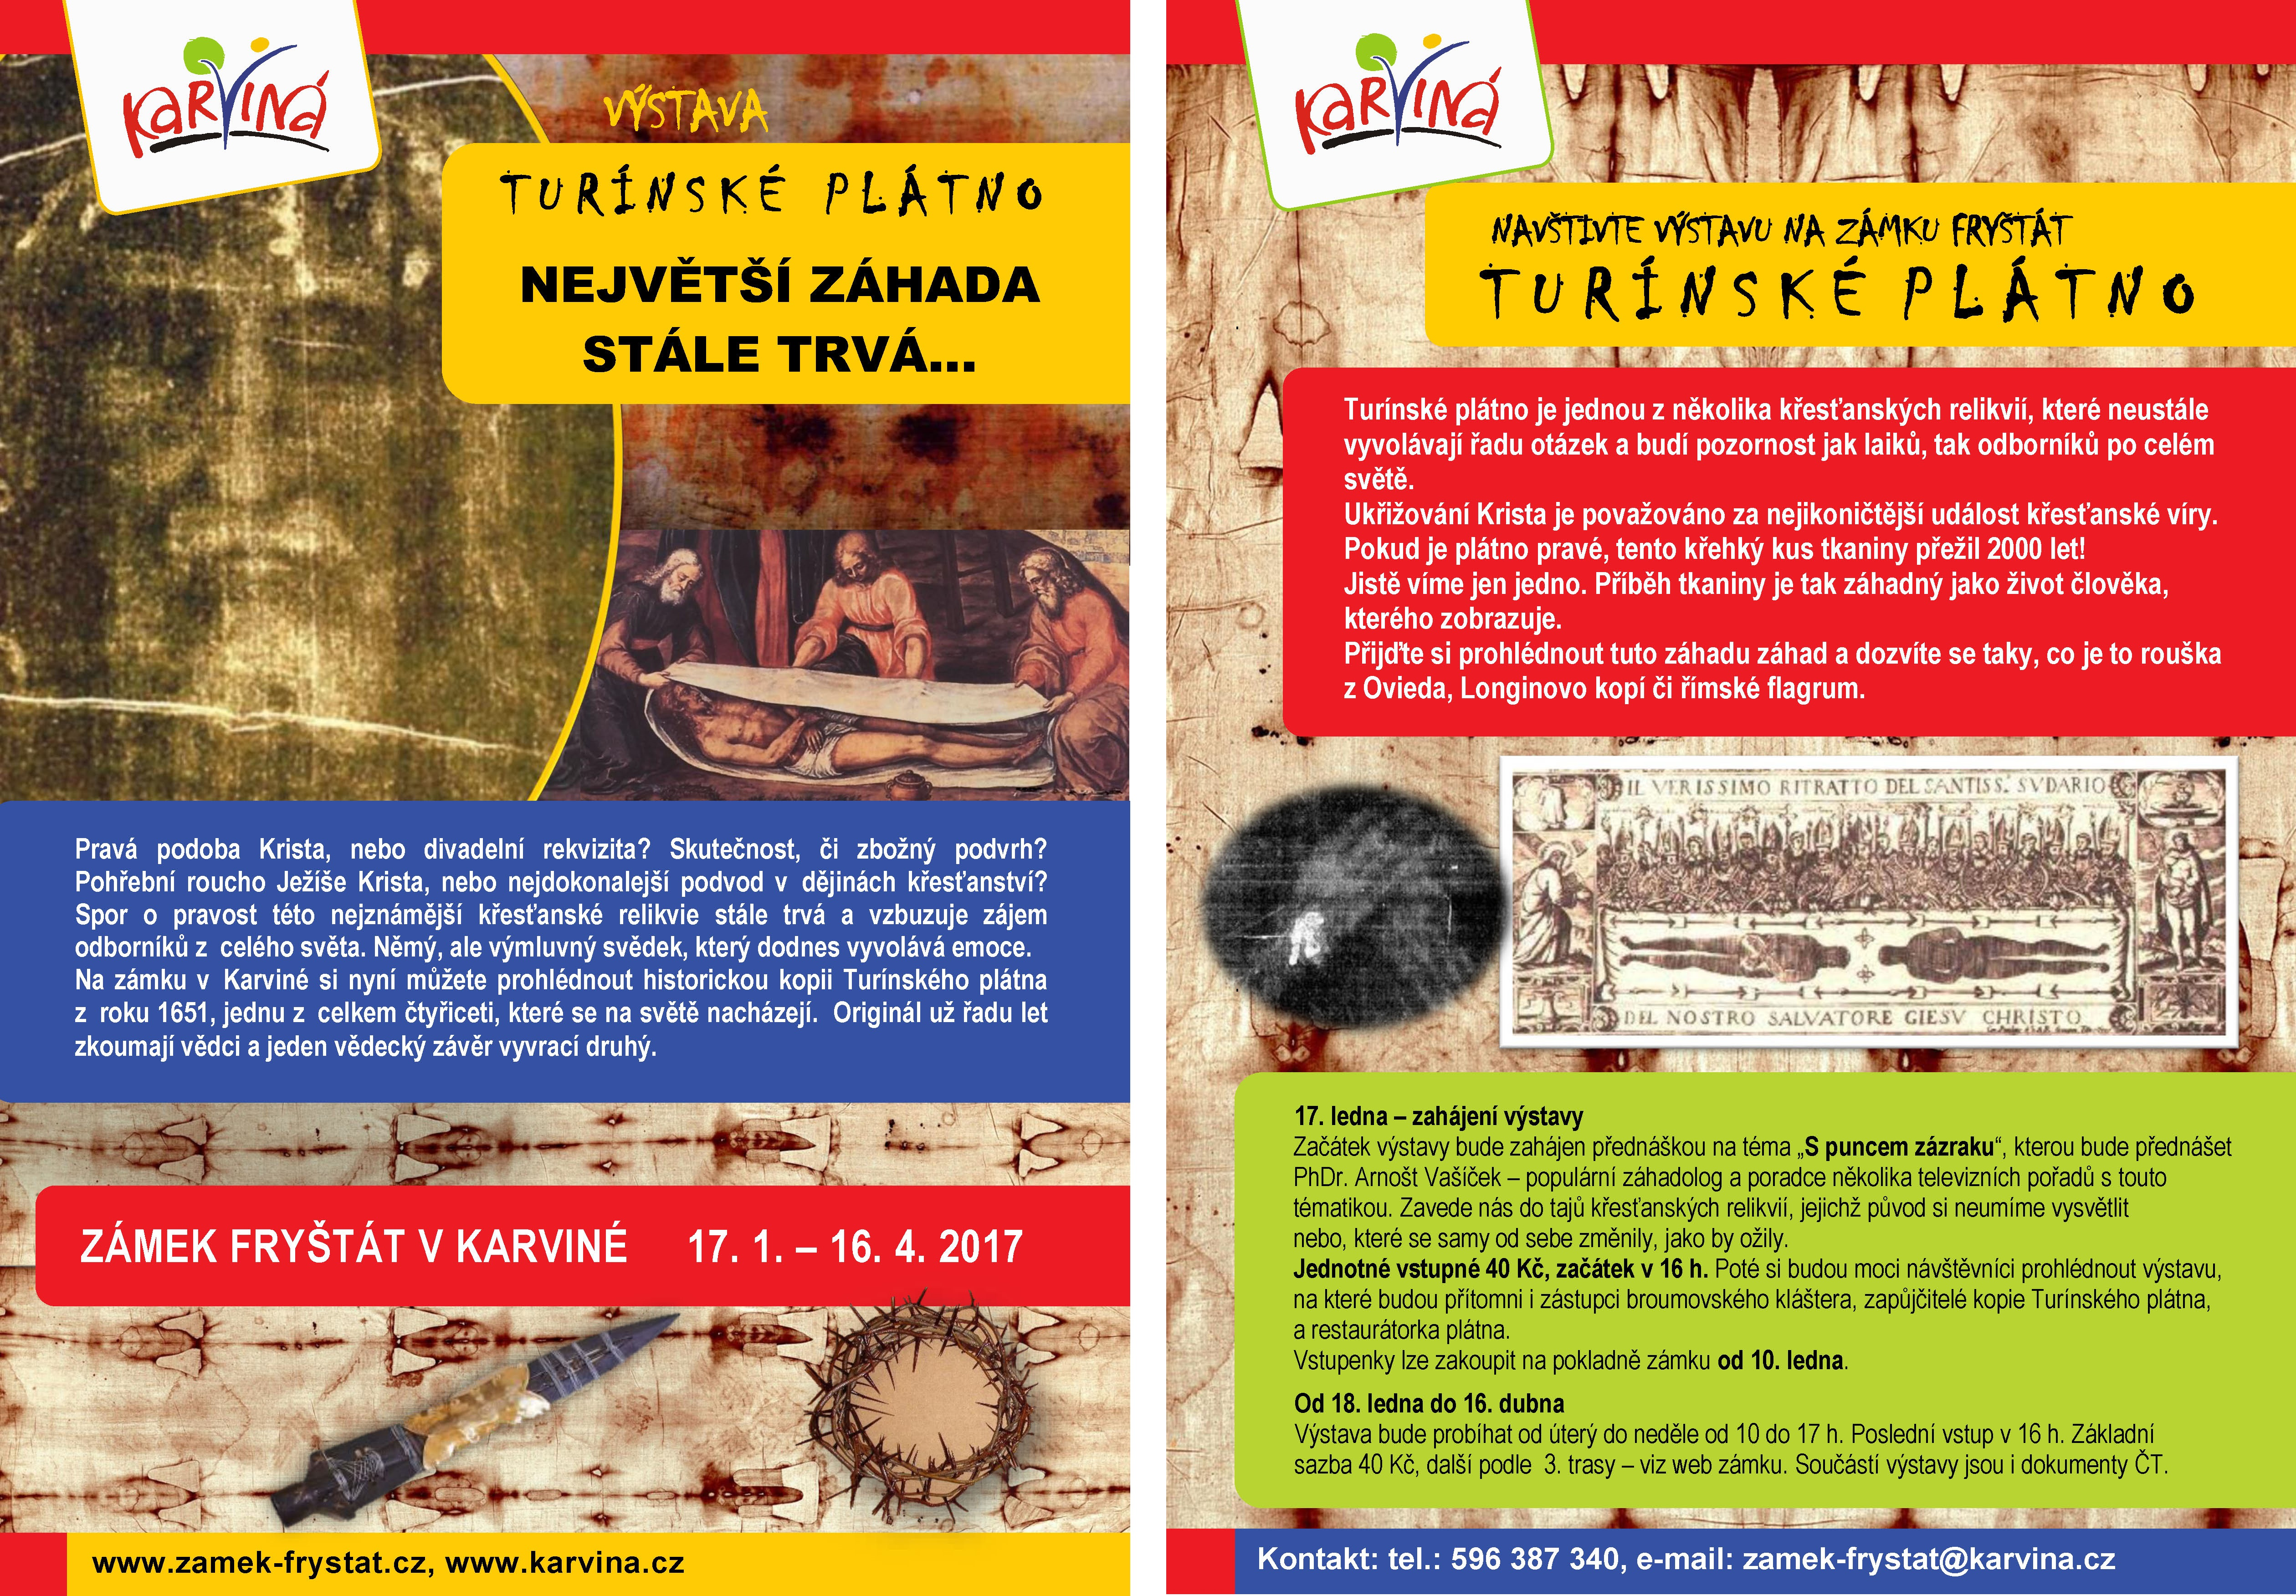 210-vystava-turinske-platno-finalni-stranka-1-kopie.jpg